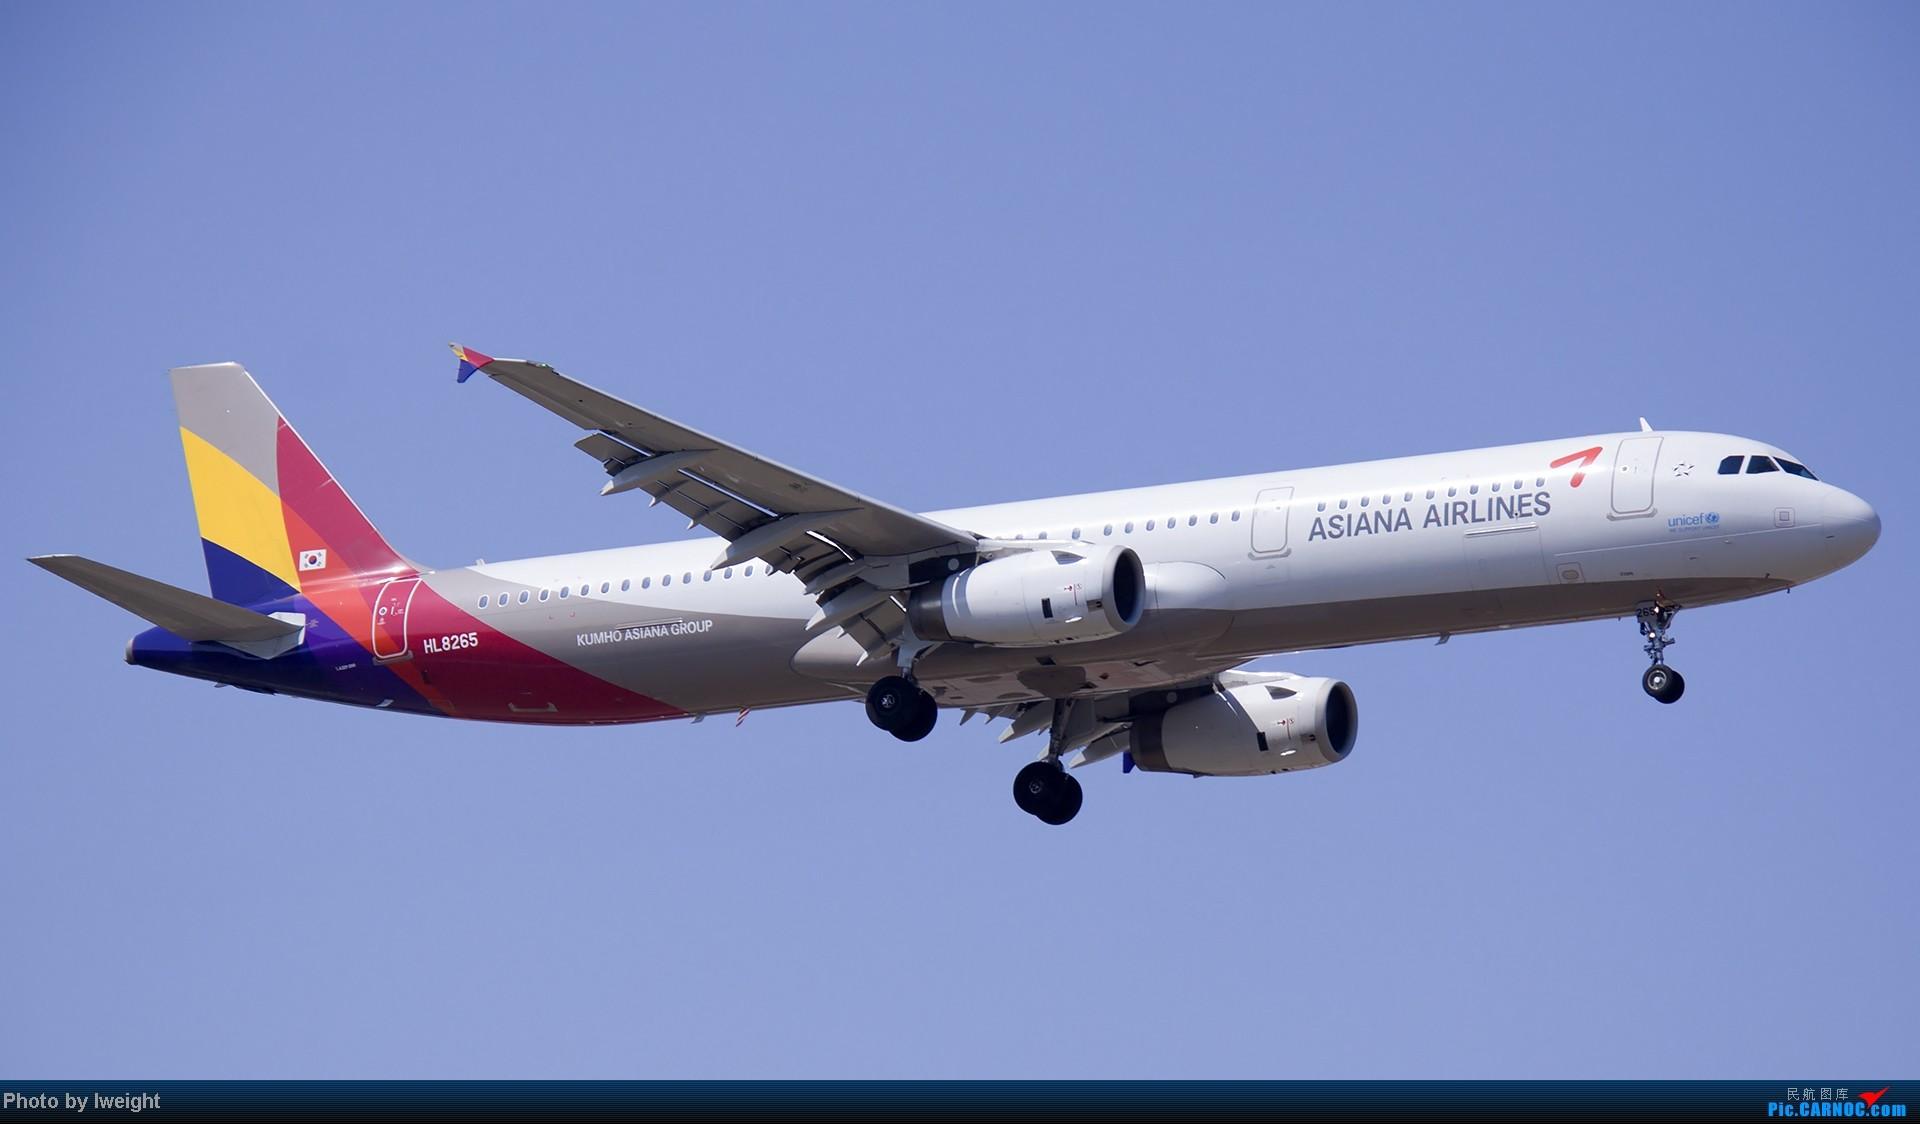 Re:[原创]北京难得的好天气,收获多种机型和彩绘,遗憾的是再次错过卡航巴塞罗那彩绘 AIRBUS A321-200 HL8265 中国北京首都机场